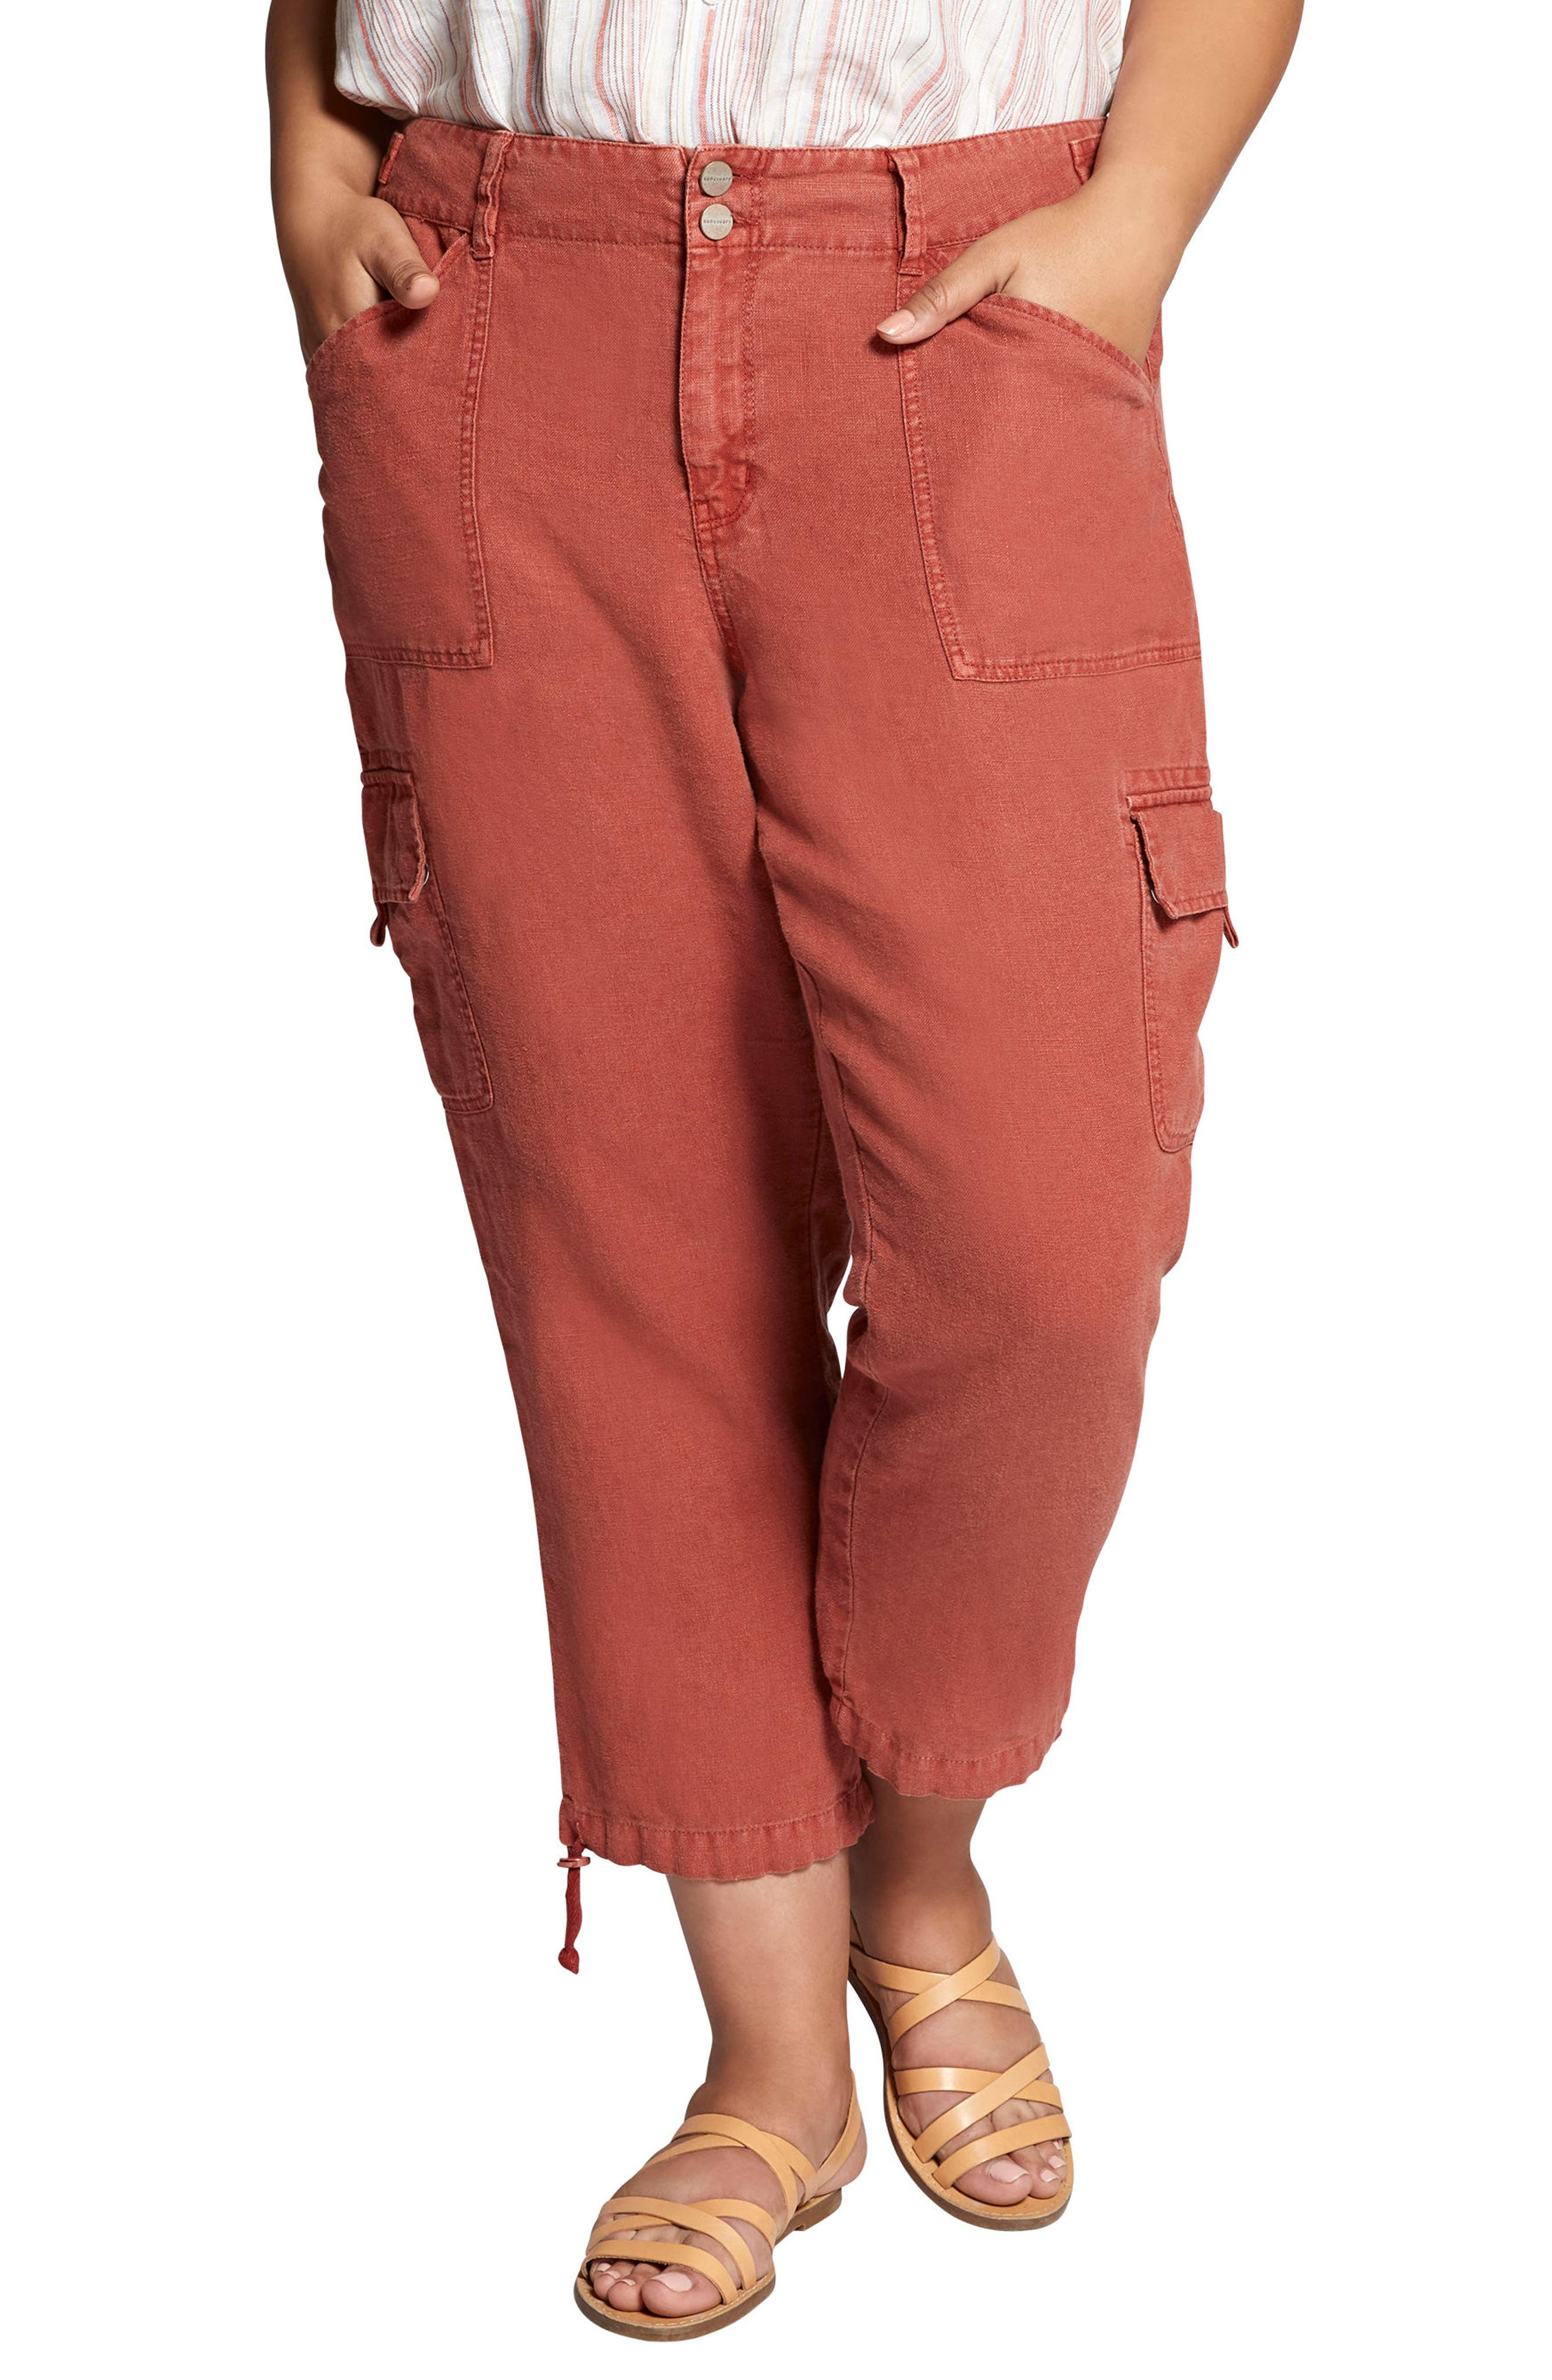 Terrain Crop Linen Cargo Pants,                             Main thumbnail 1, color,                             206